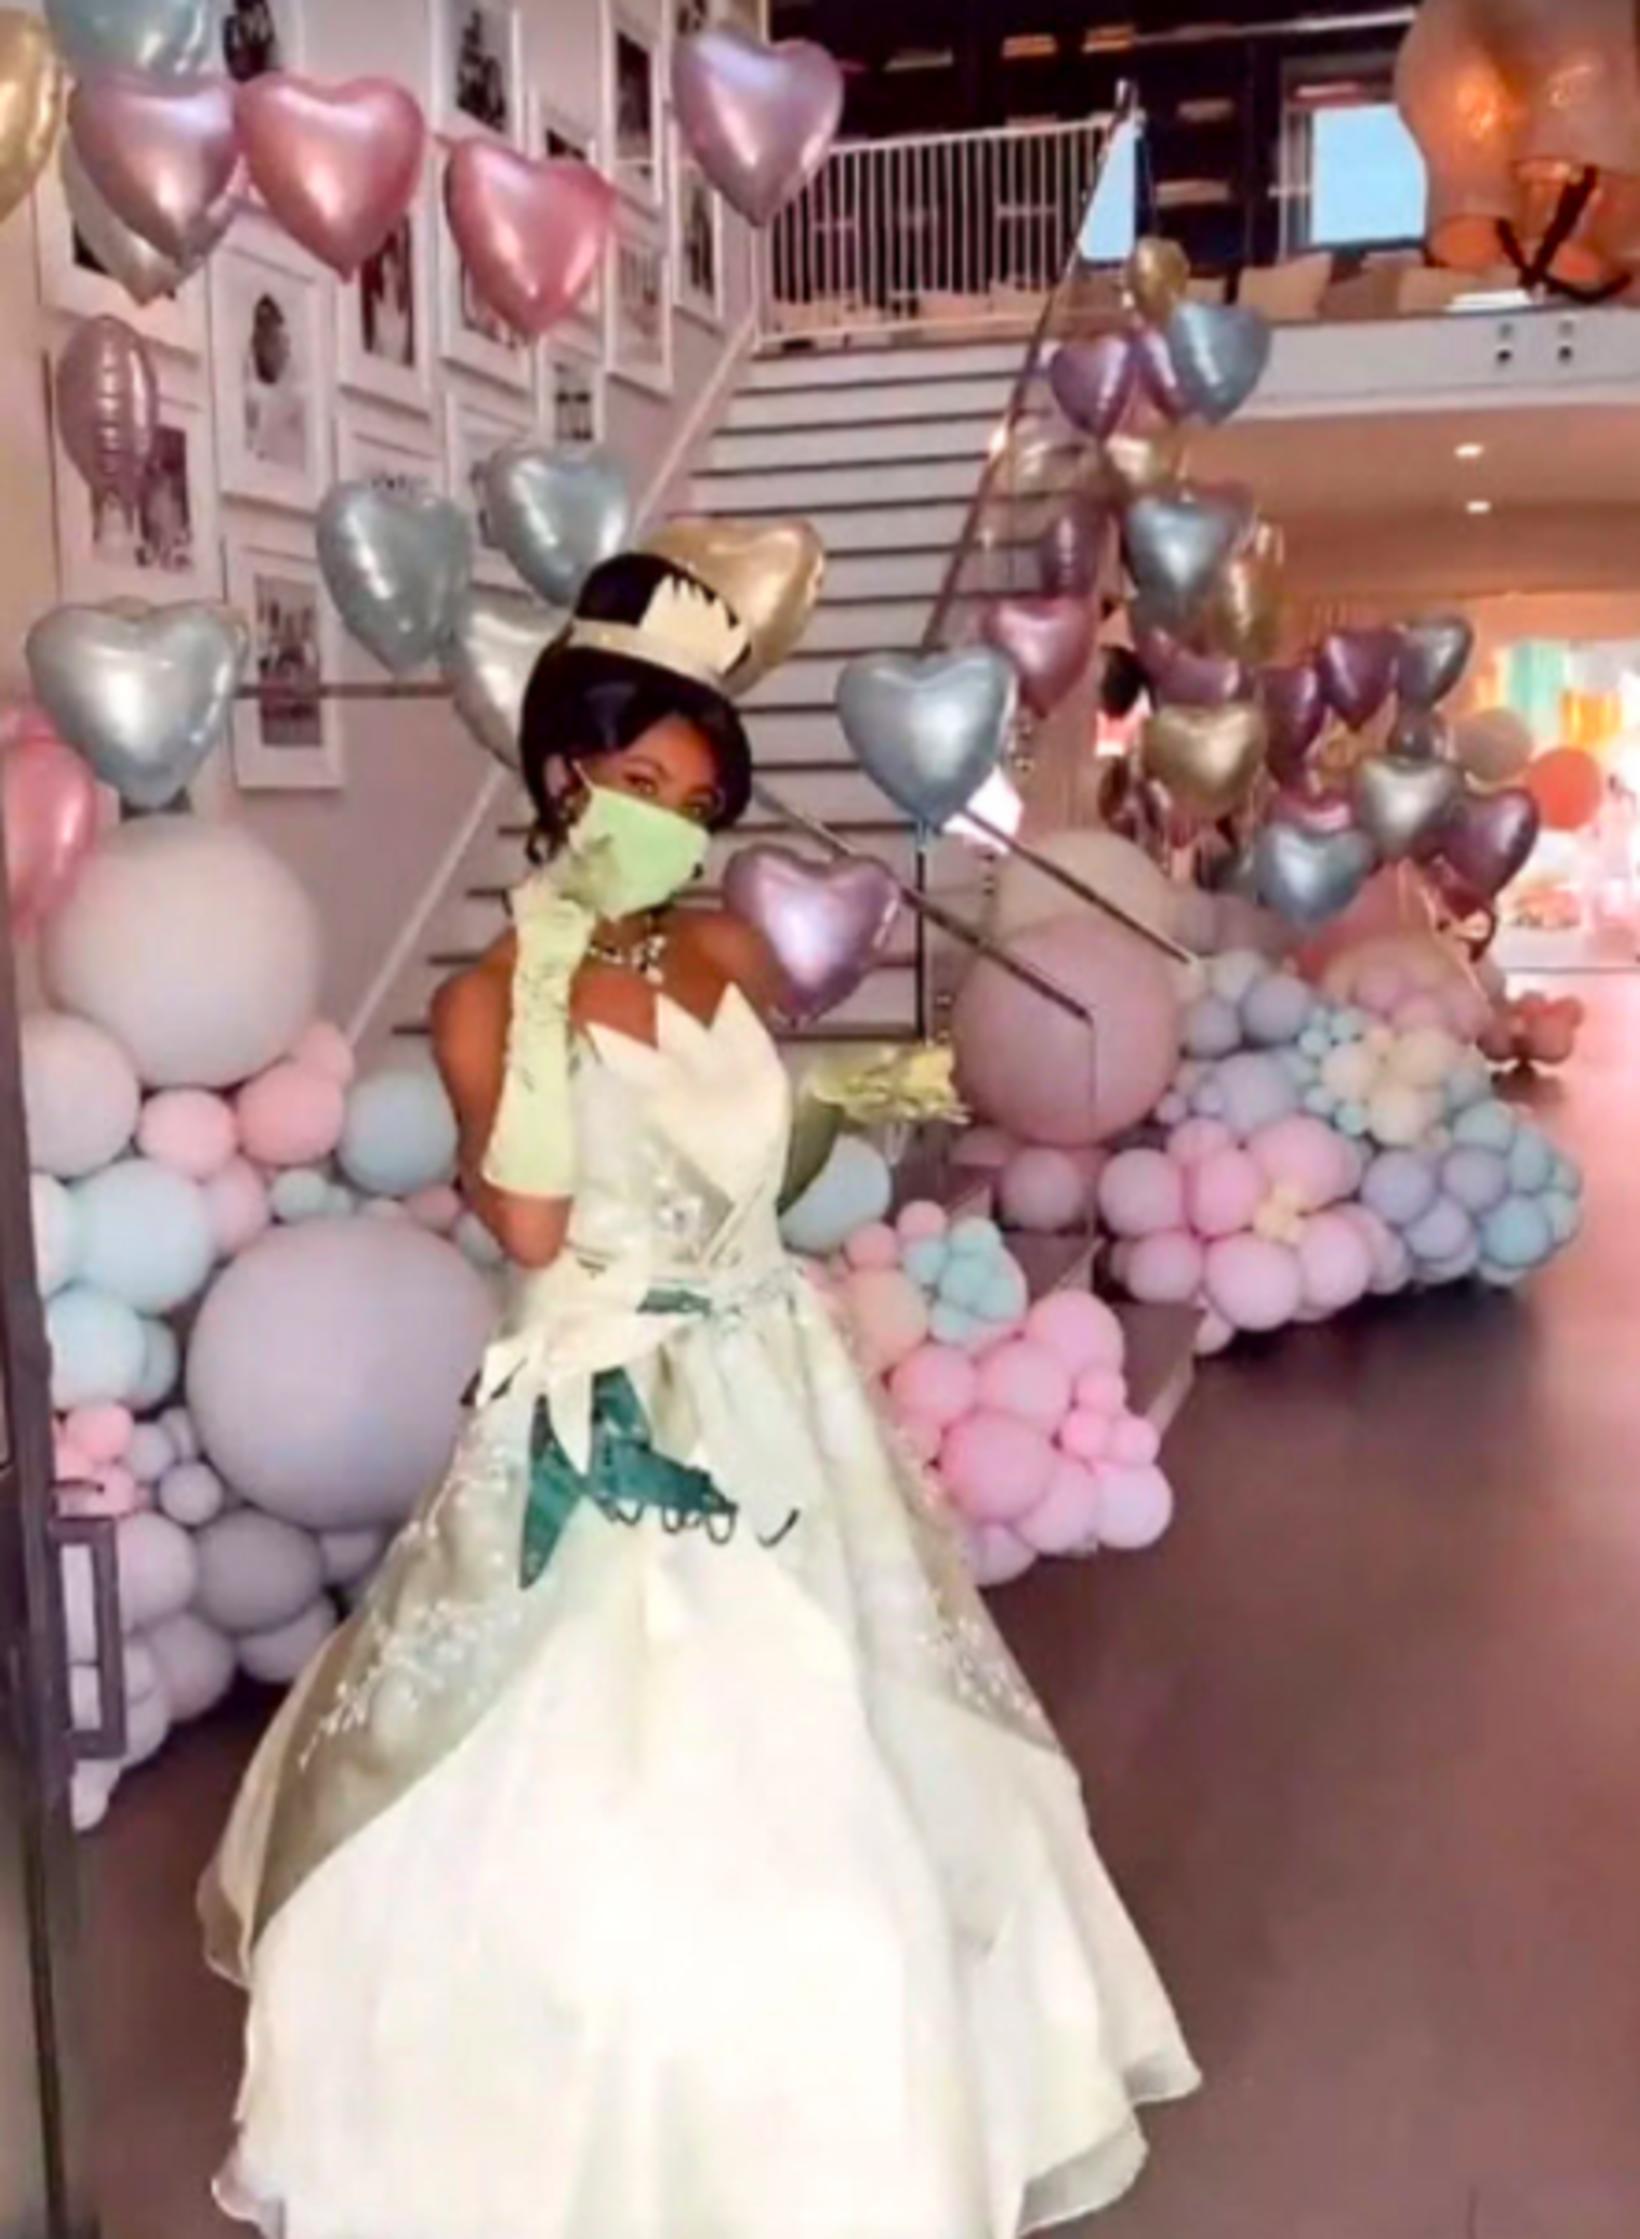 Disney prinsessur voru á hverju strái.